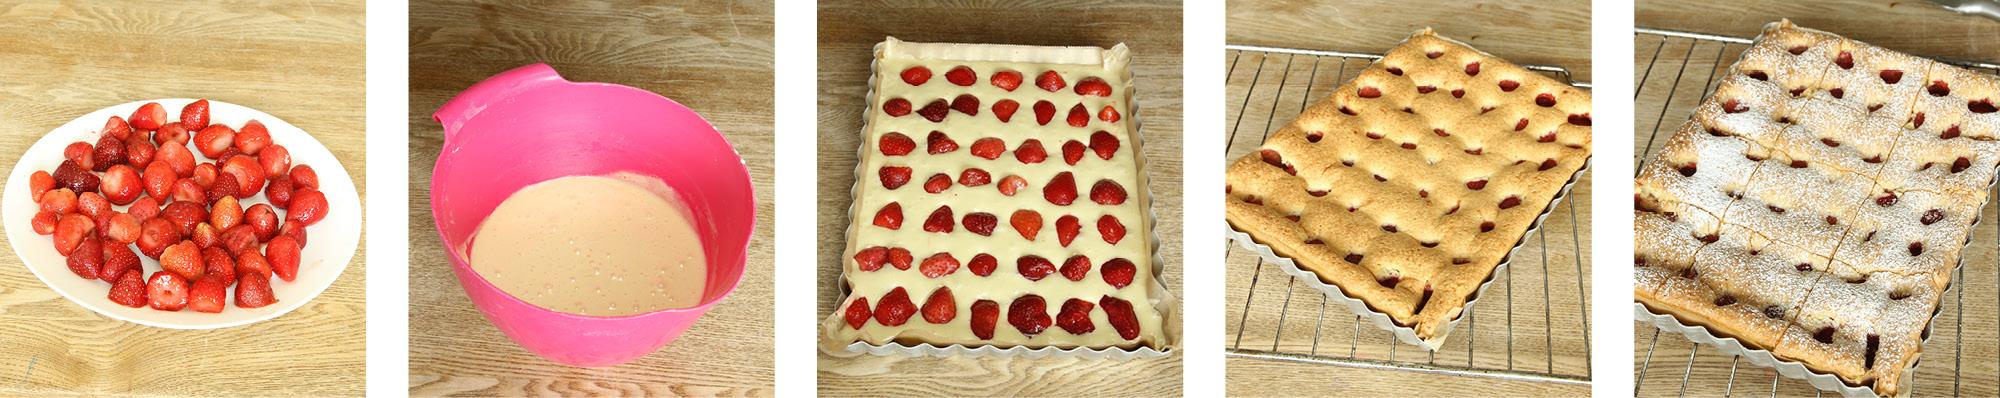 jordgubbskakastegförsteg